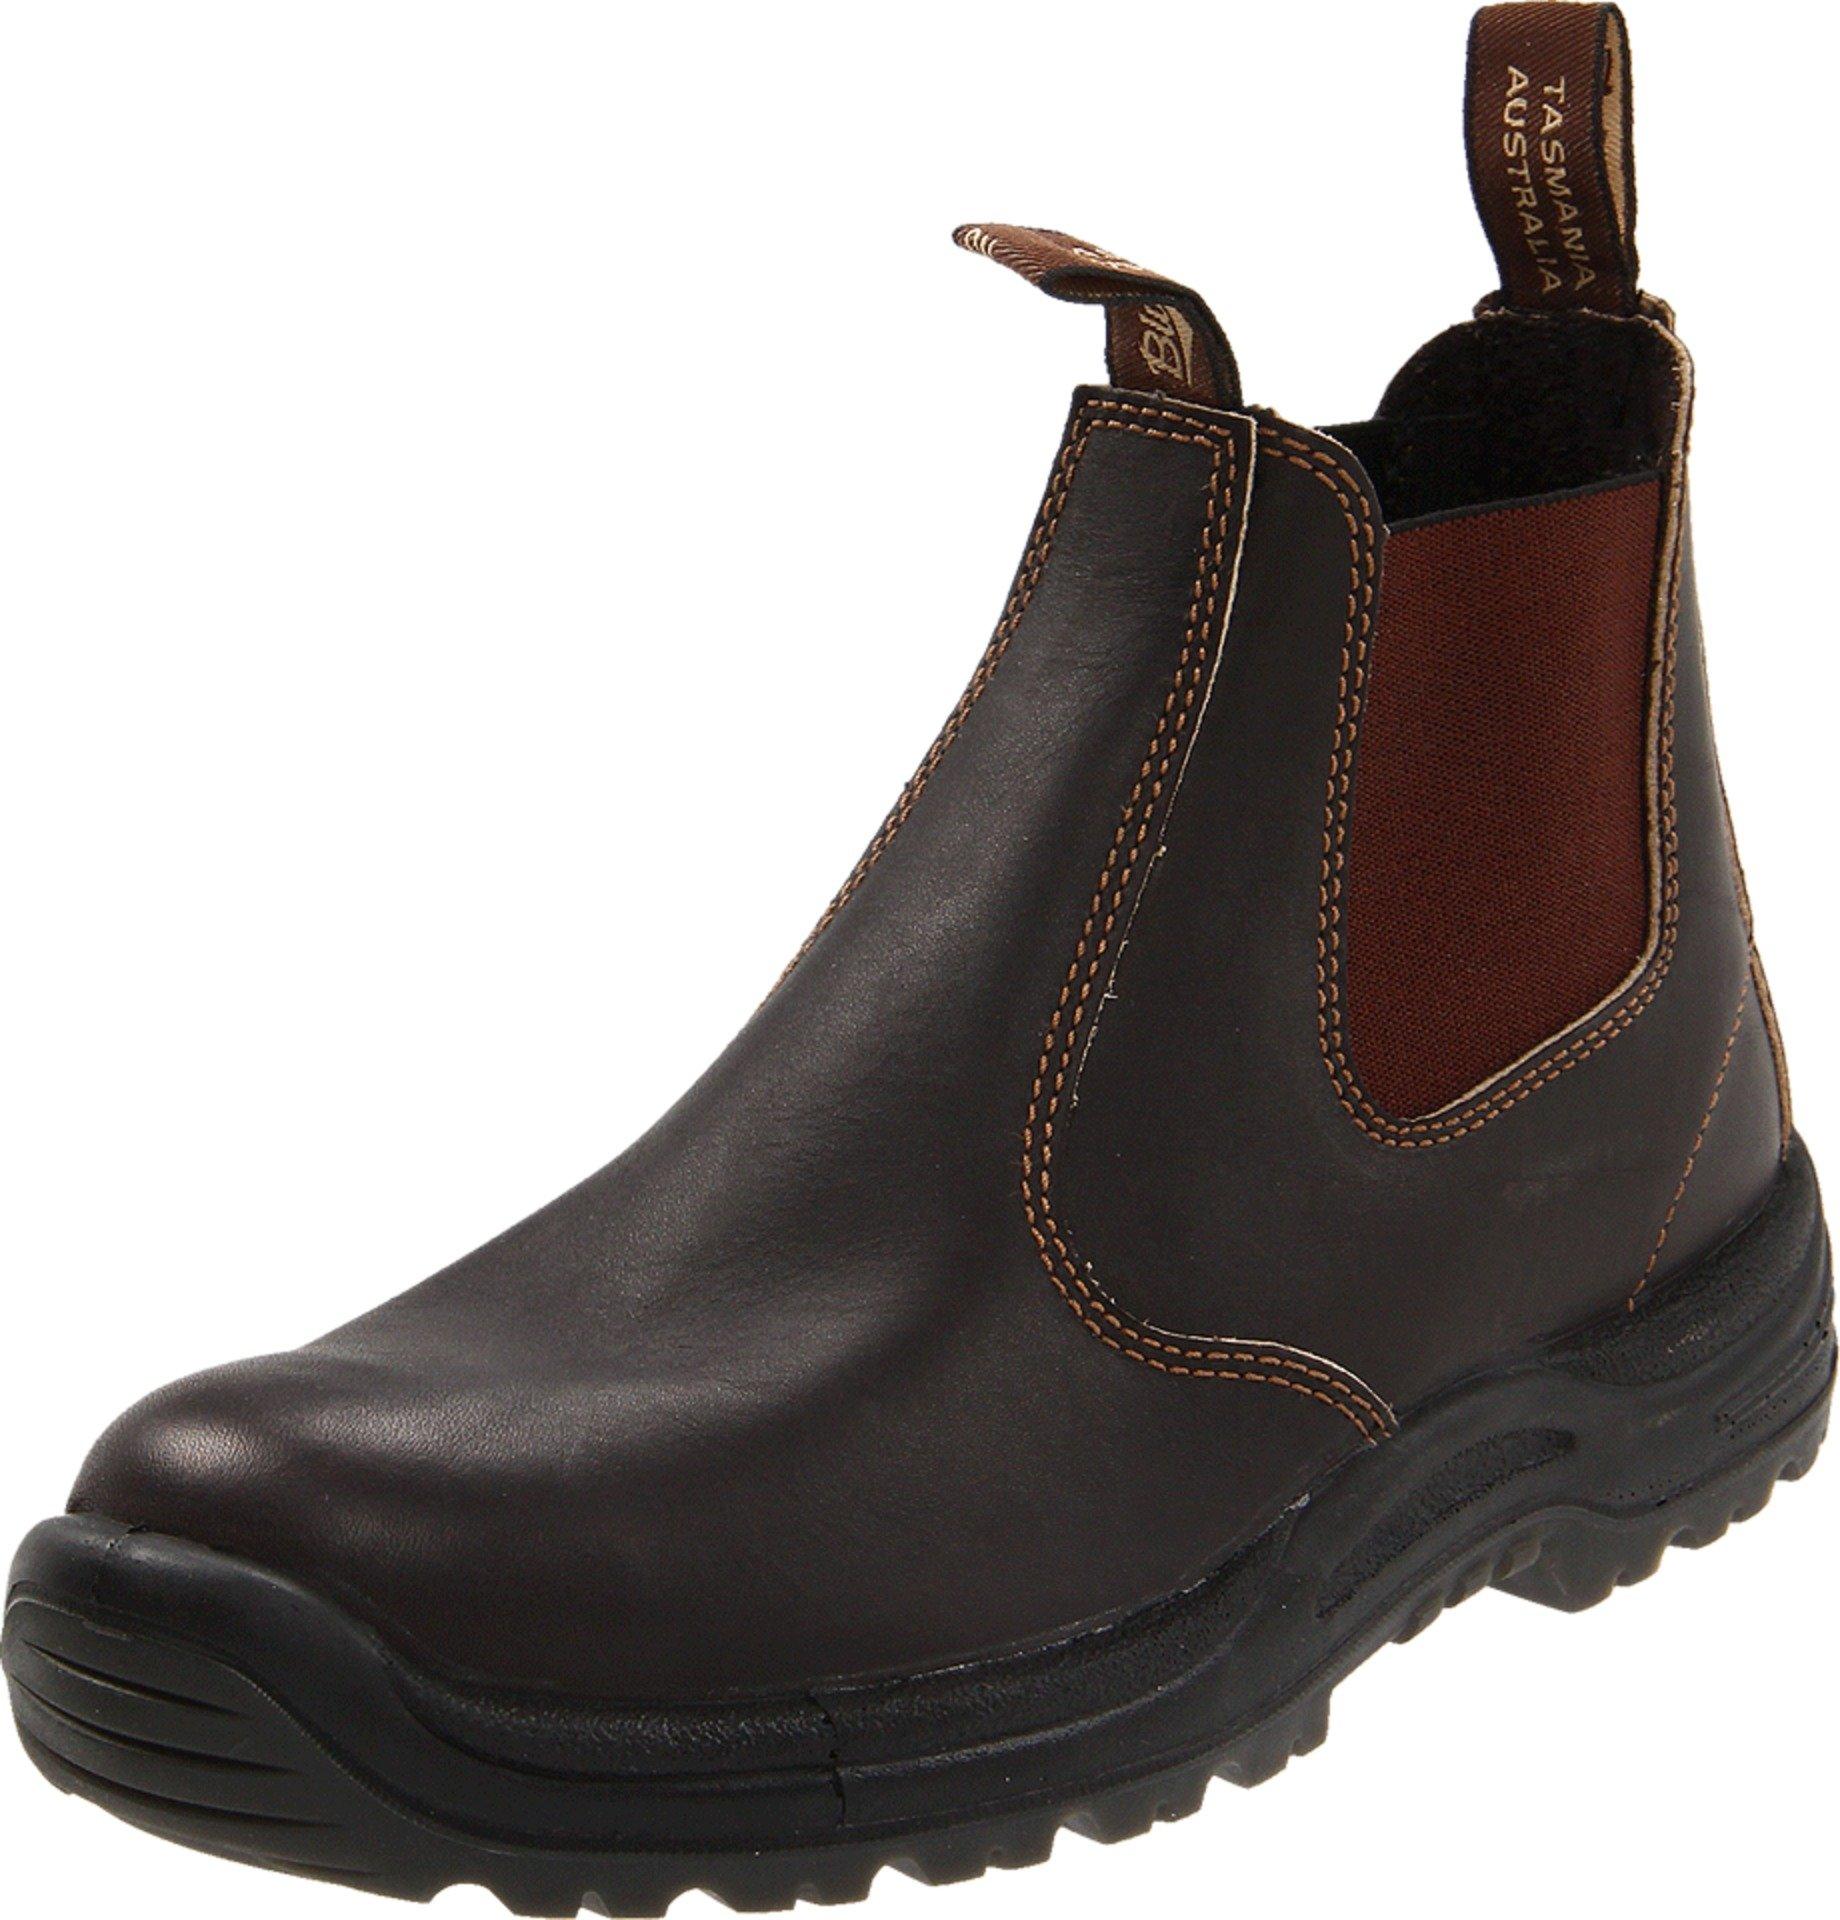 Blundstone 490 Bump-Toe Boot,Stout Brown,9 AU (US Women's 11.5 M/US Men's 10 M) by Blundstone